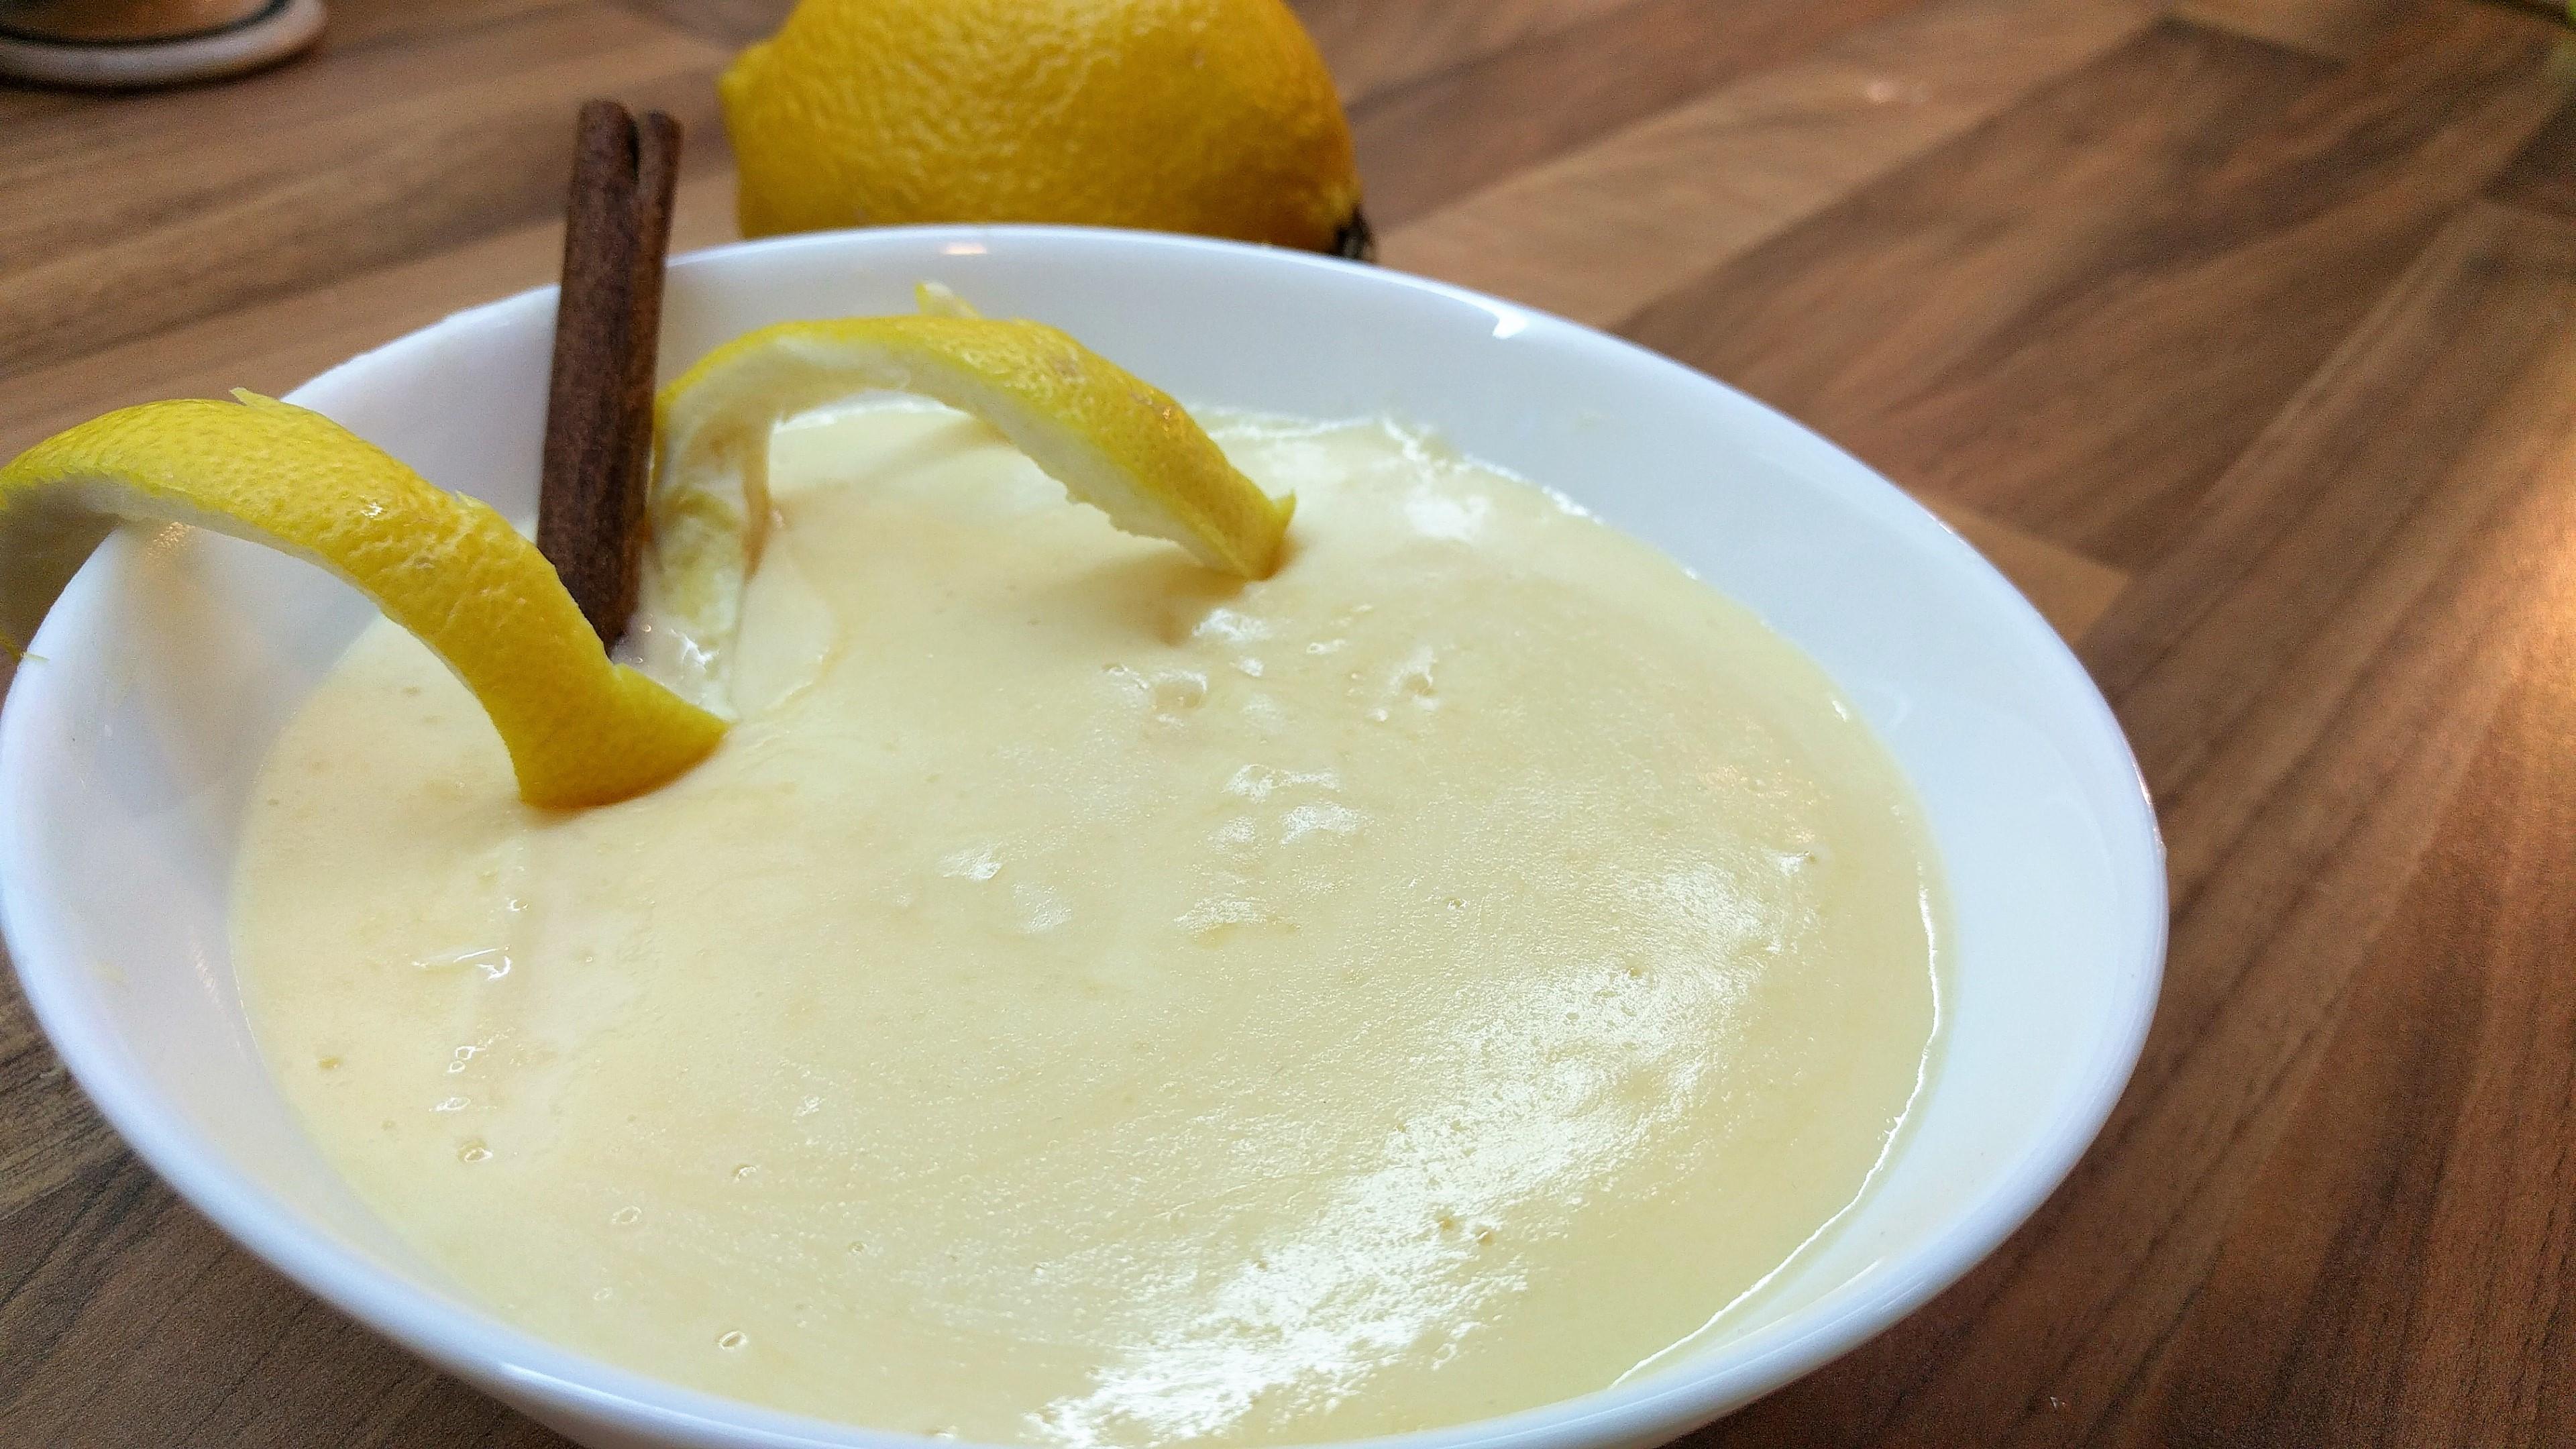 Crema Pastelera - Cocina con Gemma